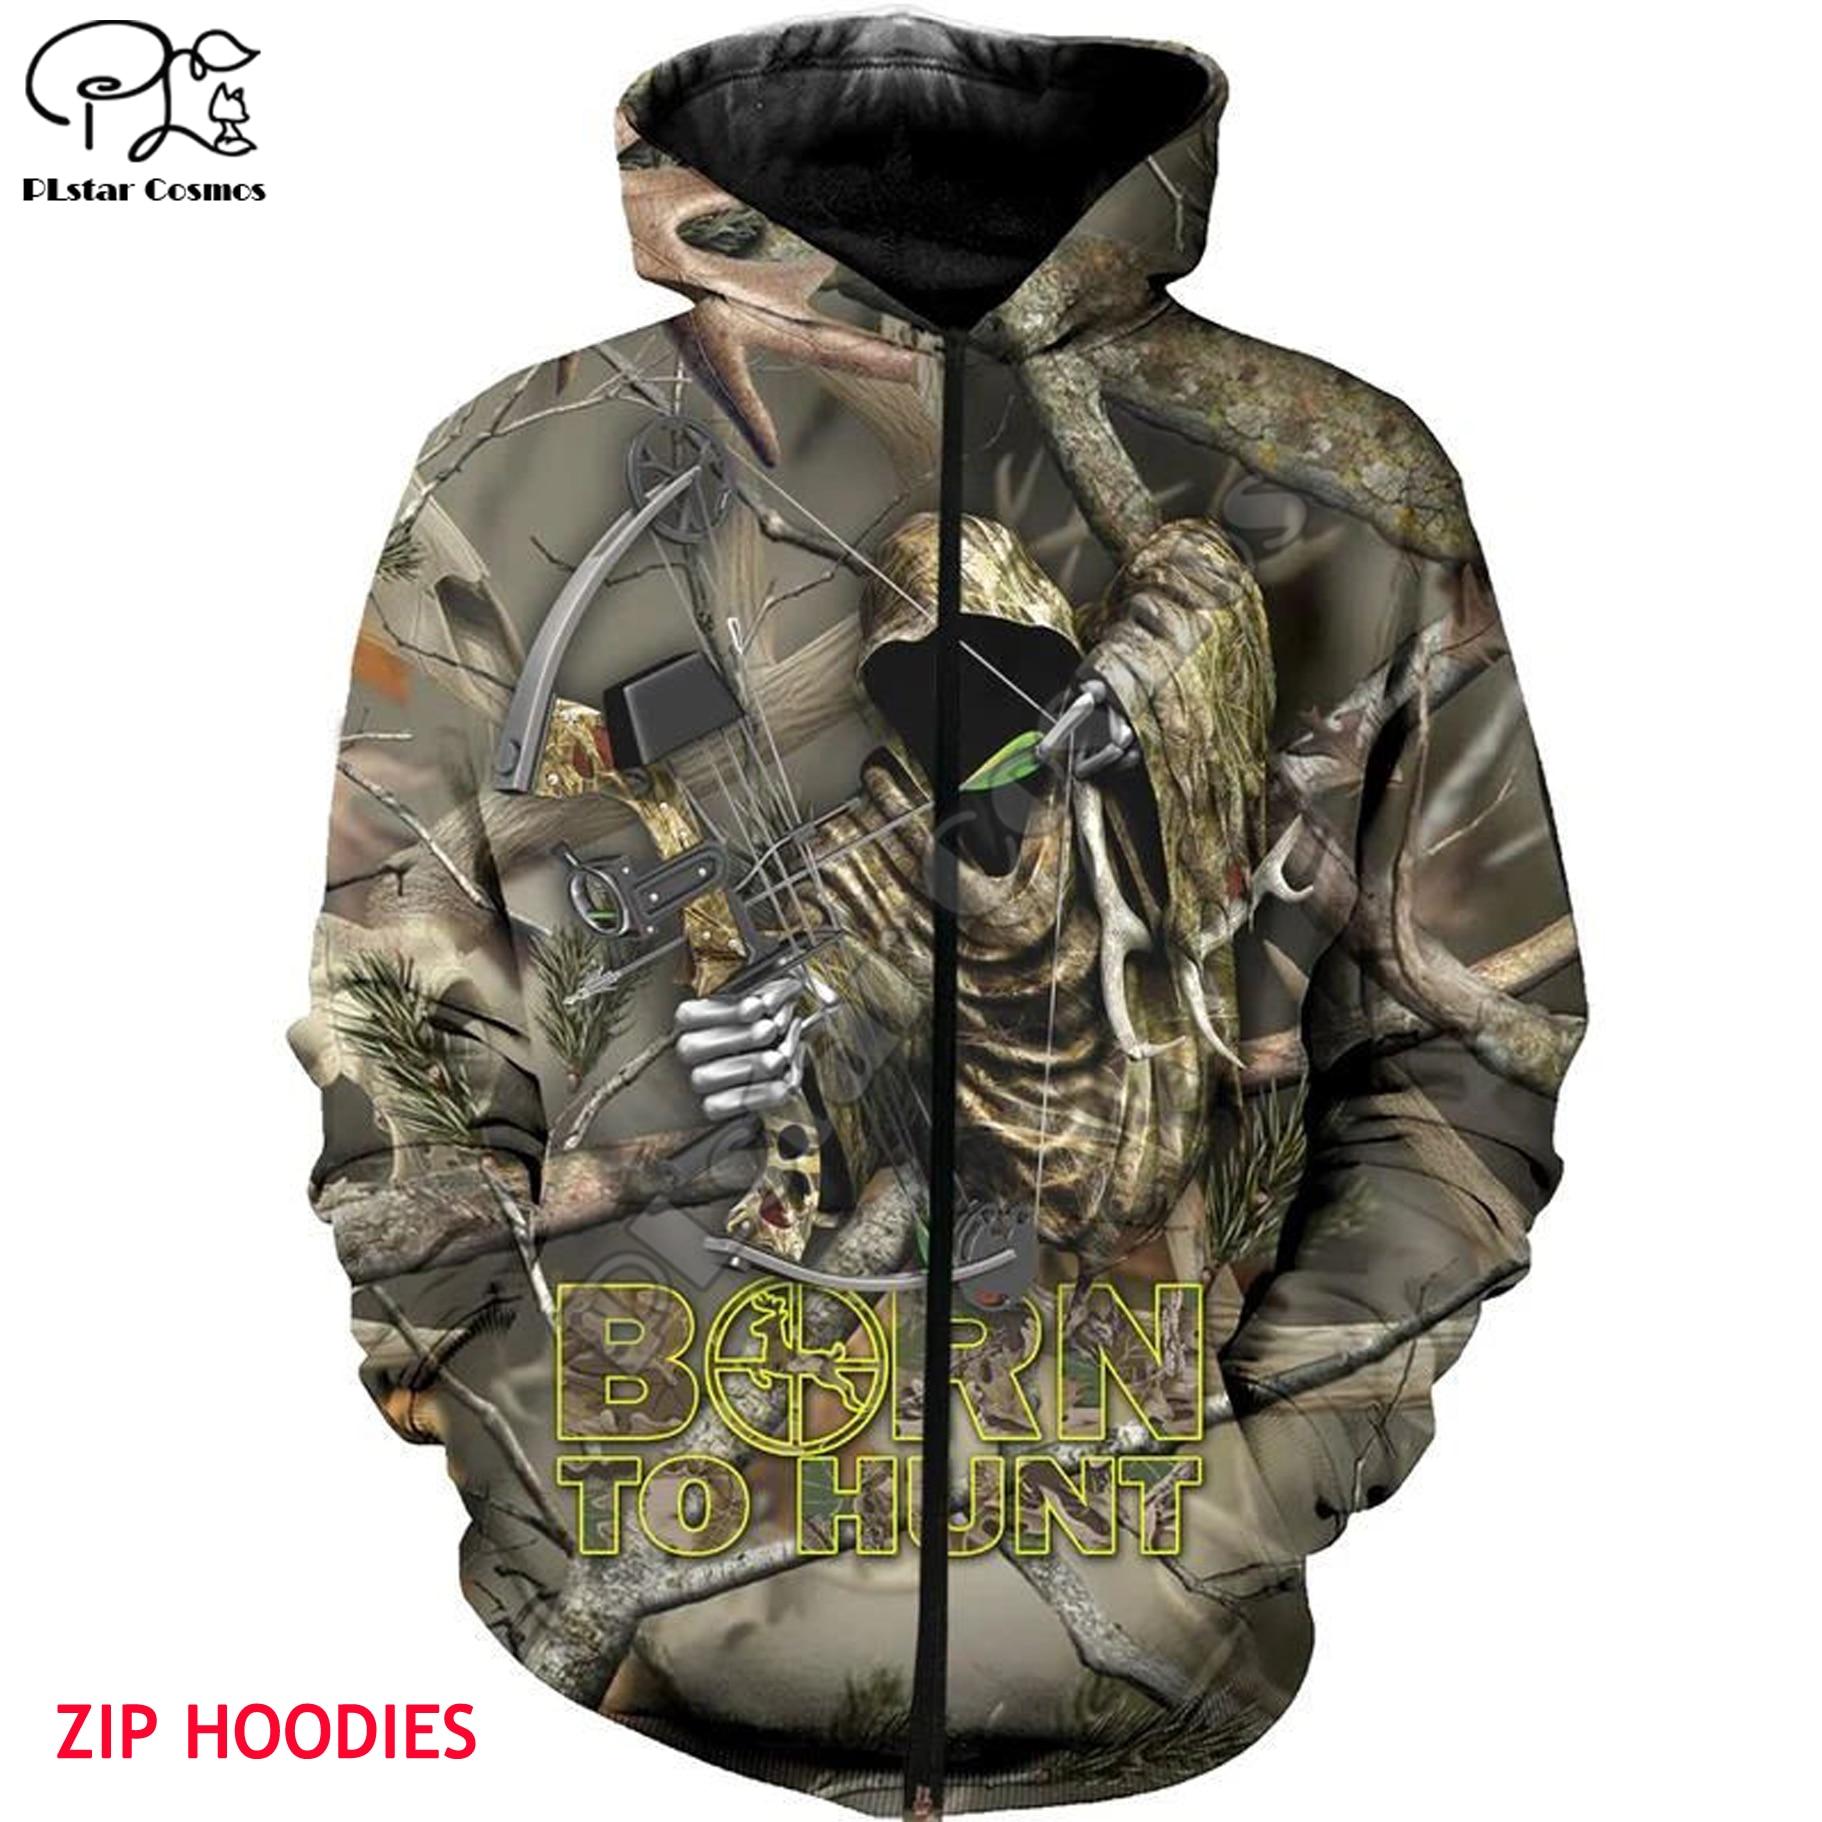 Bow Hunting 3d all over Printed Unisex hoodies Harajuku Fashion Casual Hooded Sweatshirt zip hoodies drop shipping